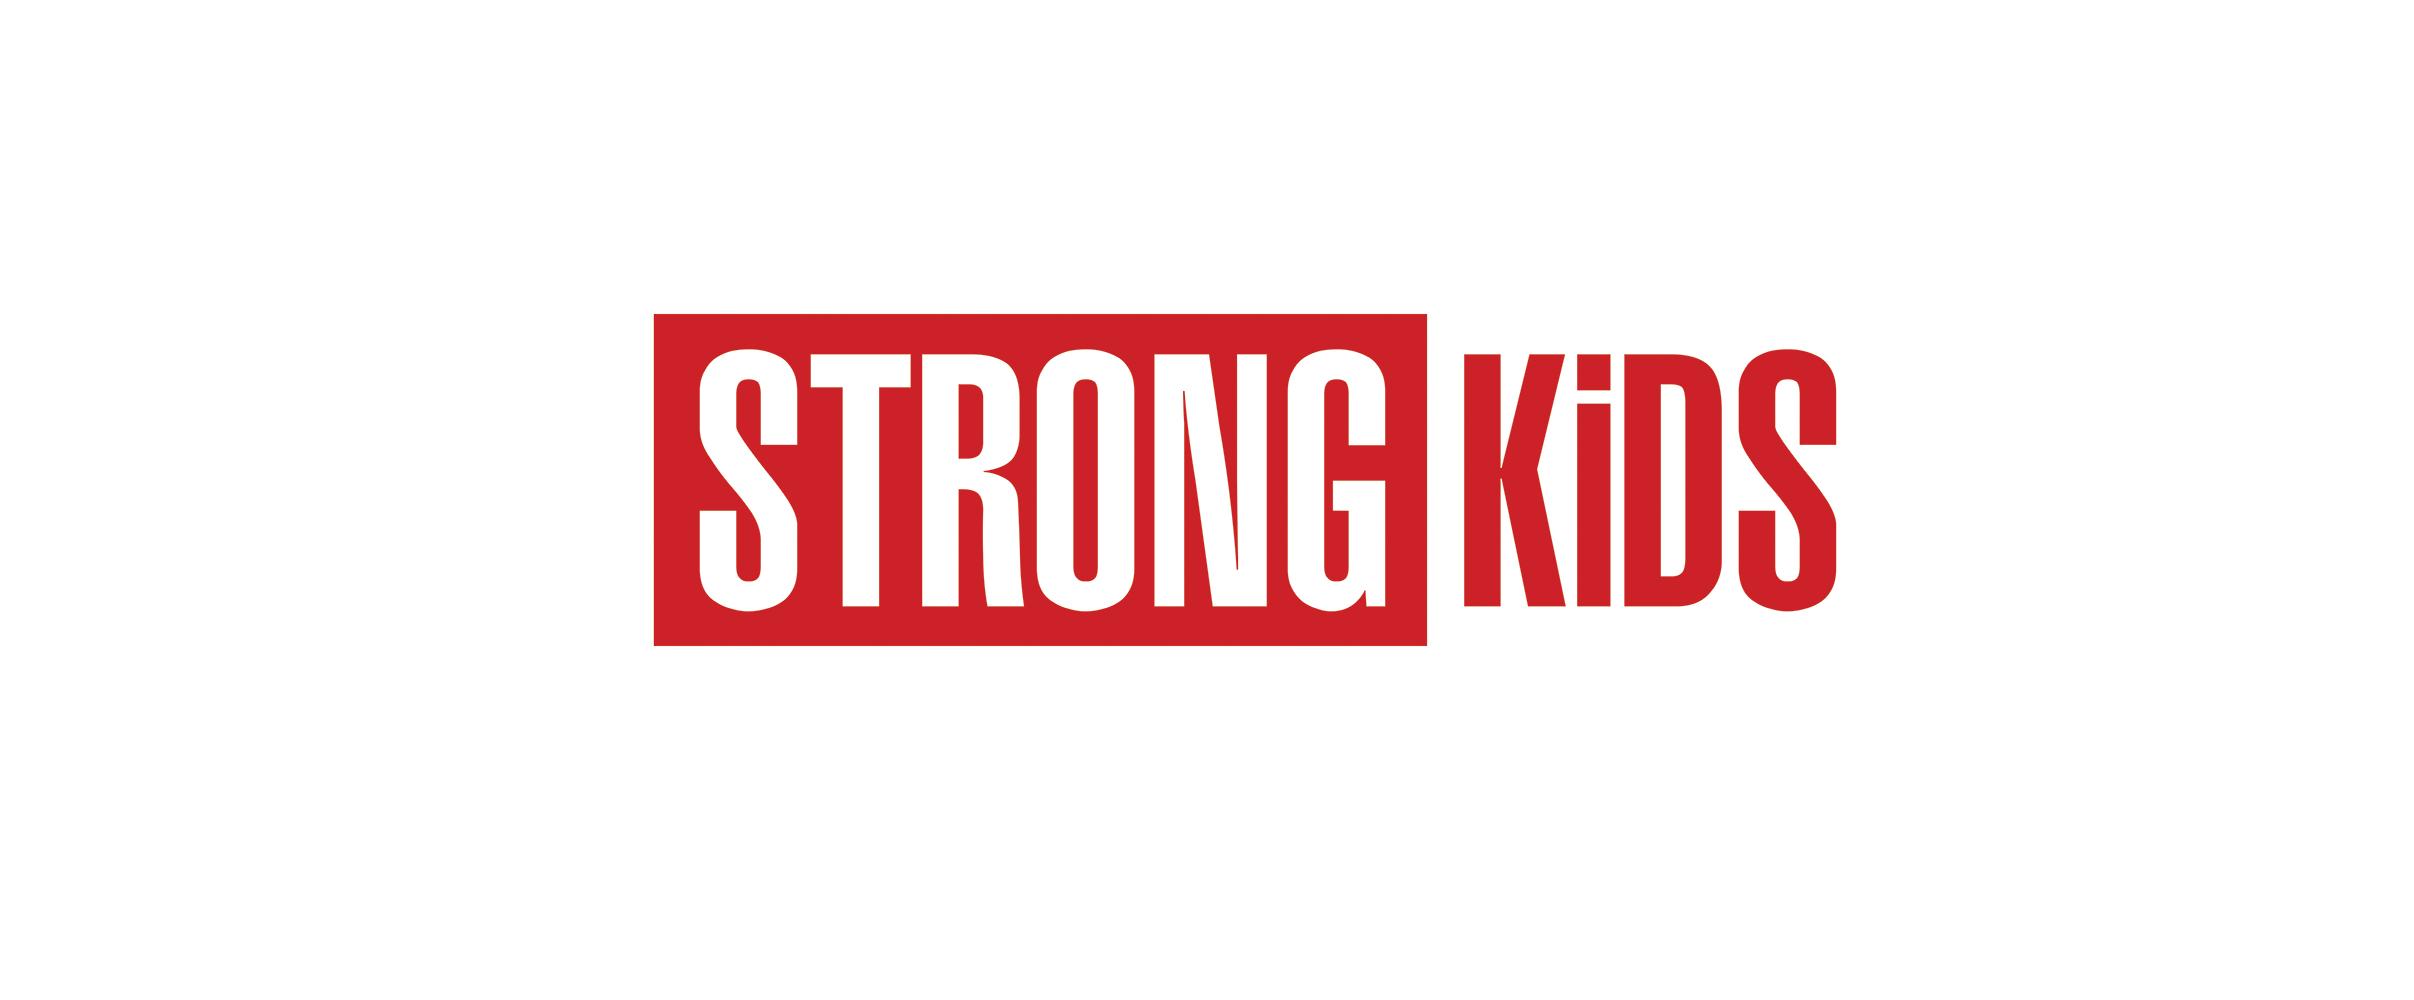 Логотип для Детского Интернет Магазина StrongKids фото f_7695c6a4eb4279d1.jpg